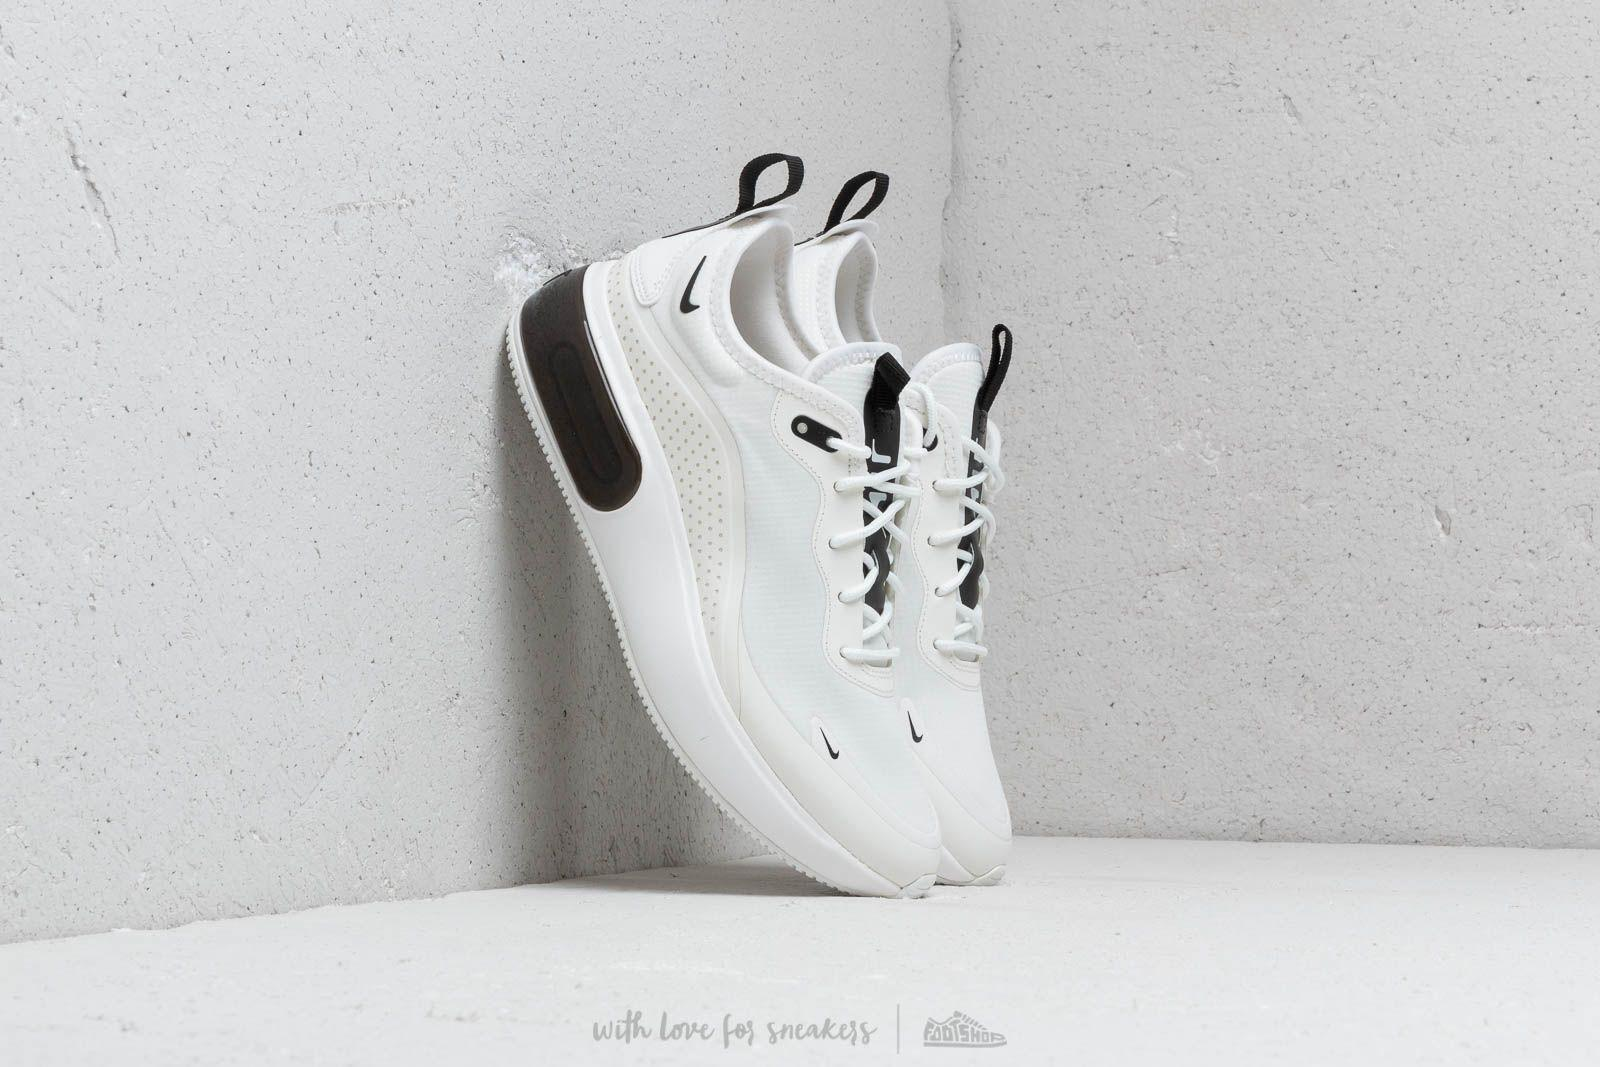 reputable site 30ea9 fd92a Lyst - Nike W Air Max Dia Summit White  Black-summit White in White